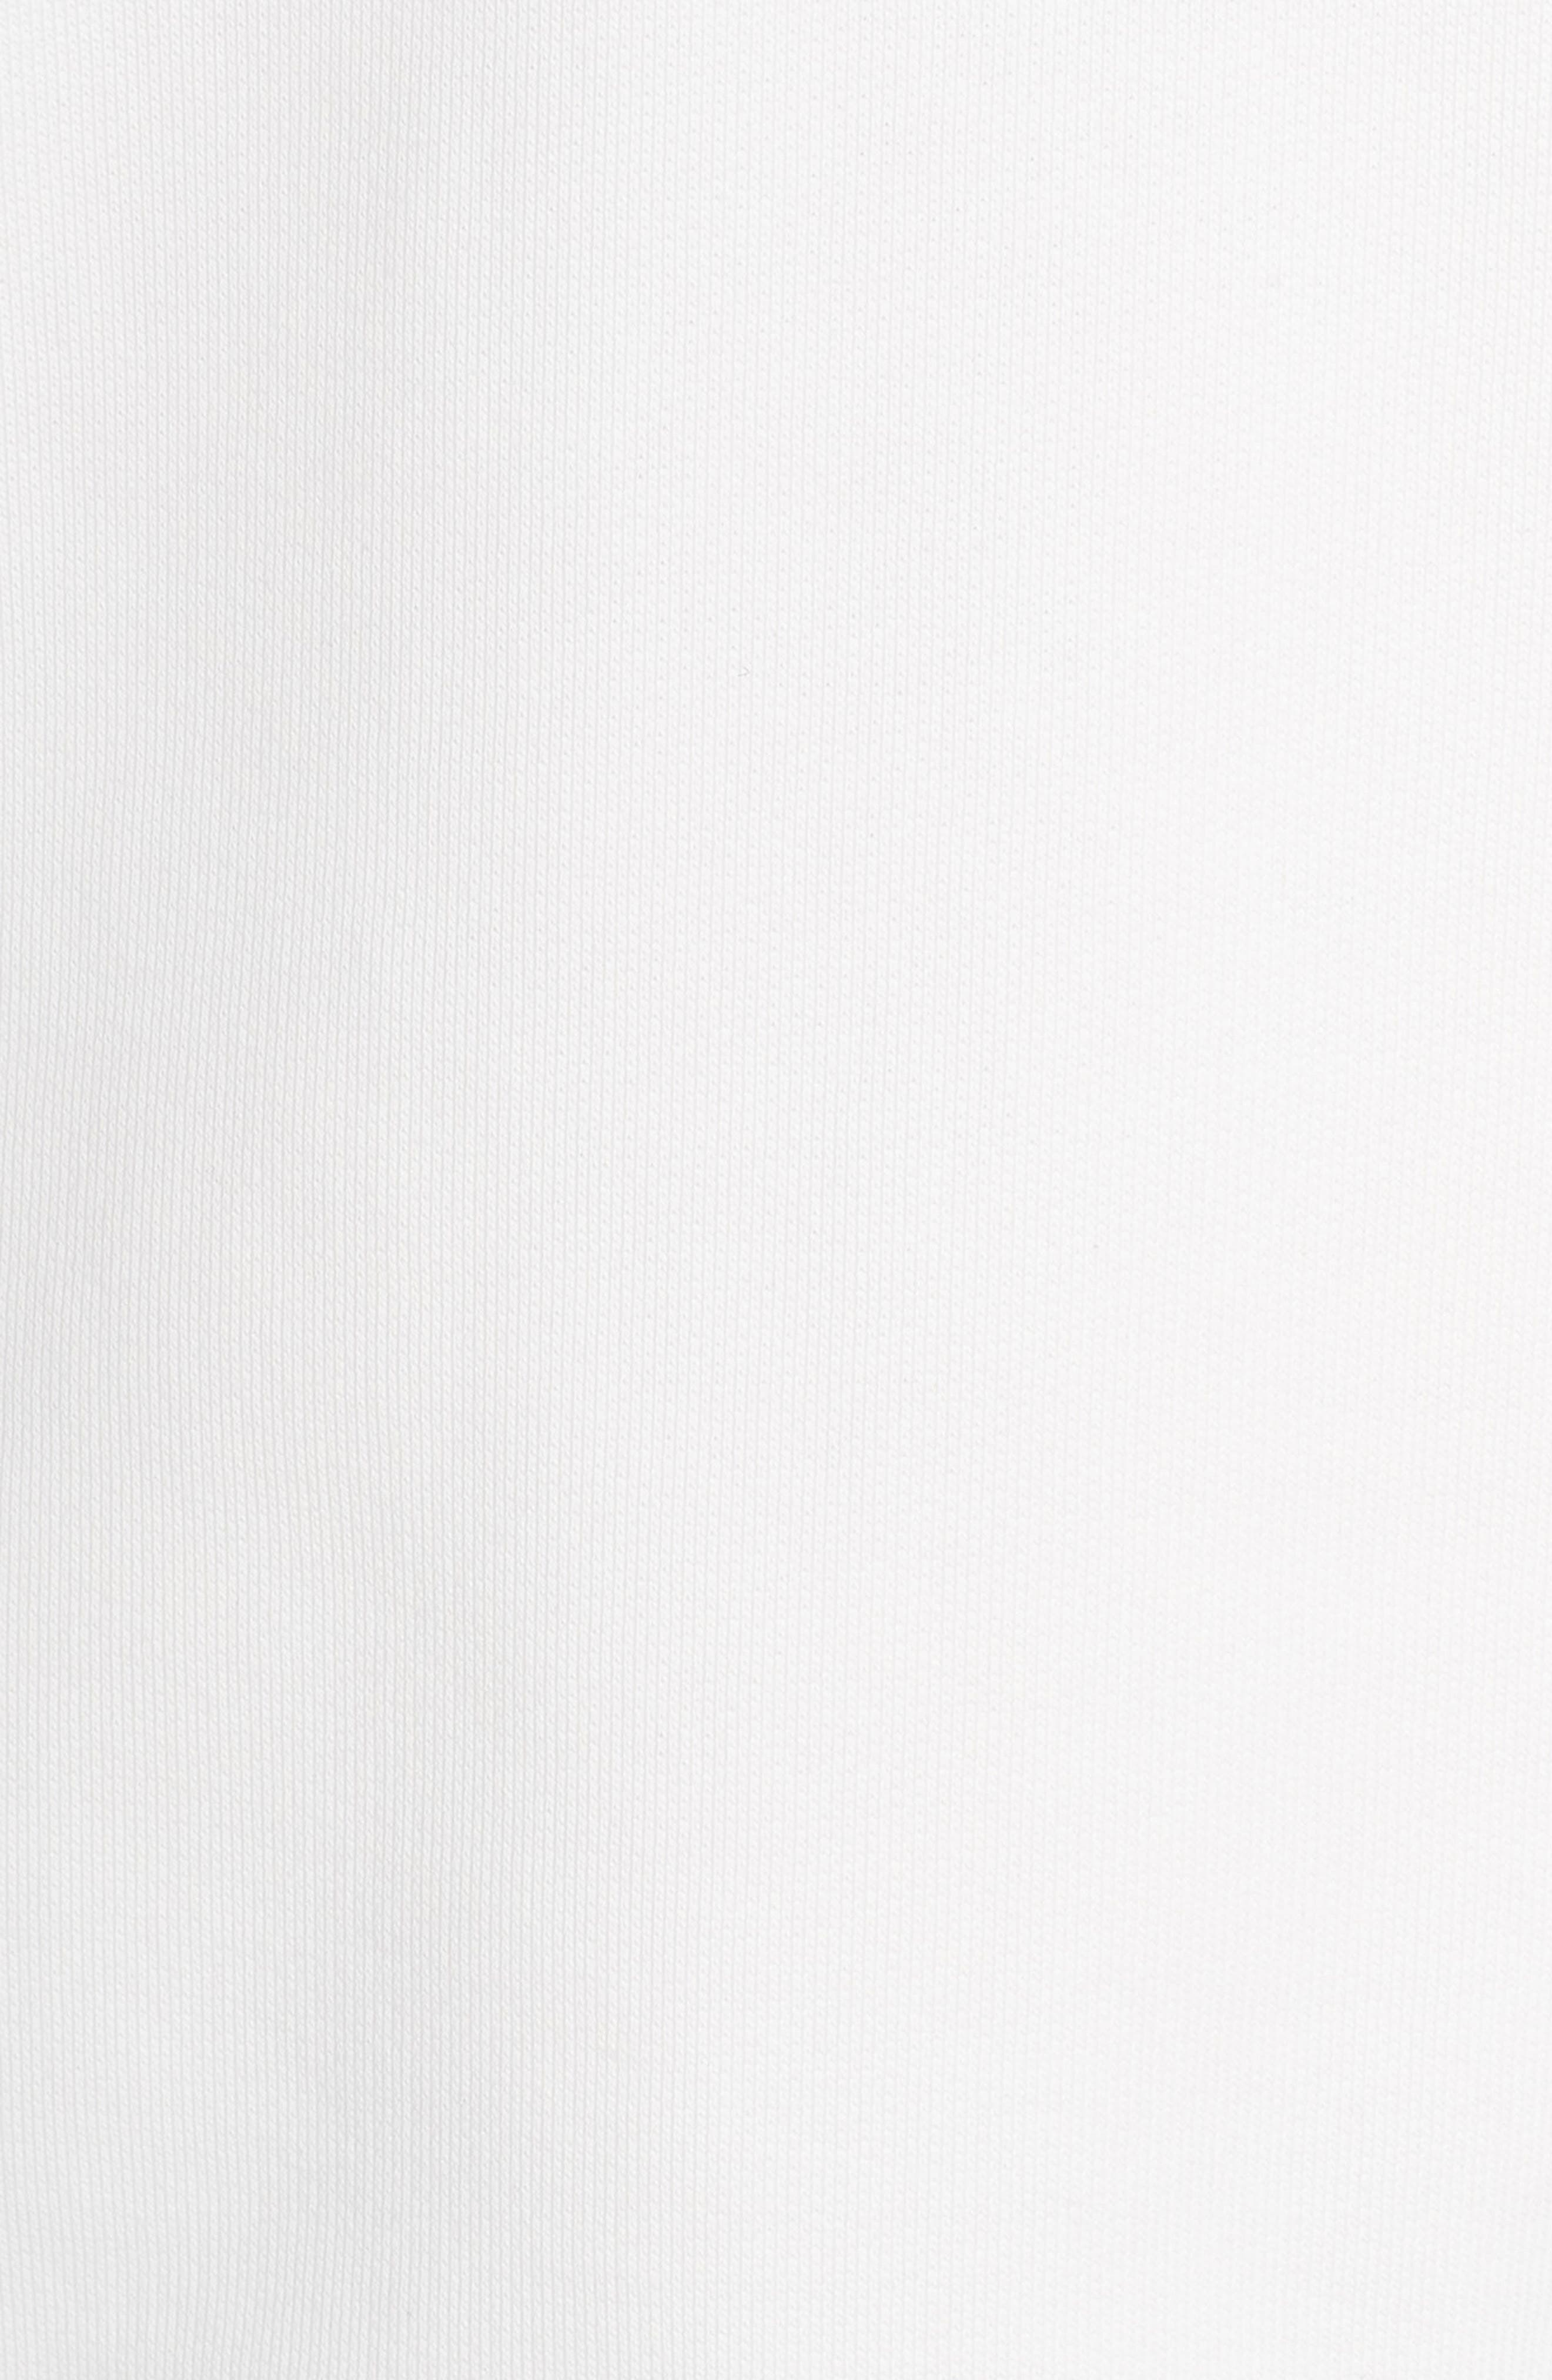 adidas x Alexander Wang Graphite Sweatshirt,                             Alternate thumbnail 6, color,                             900